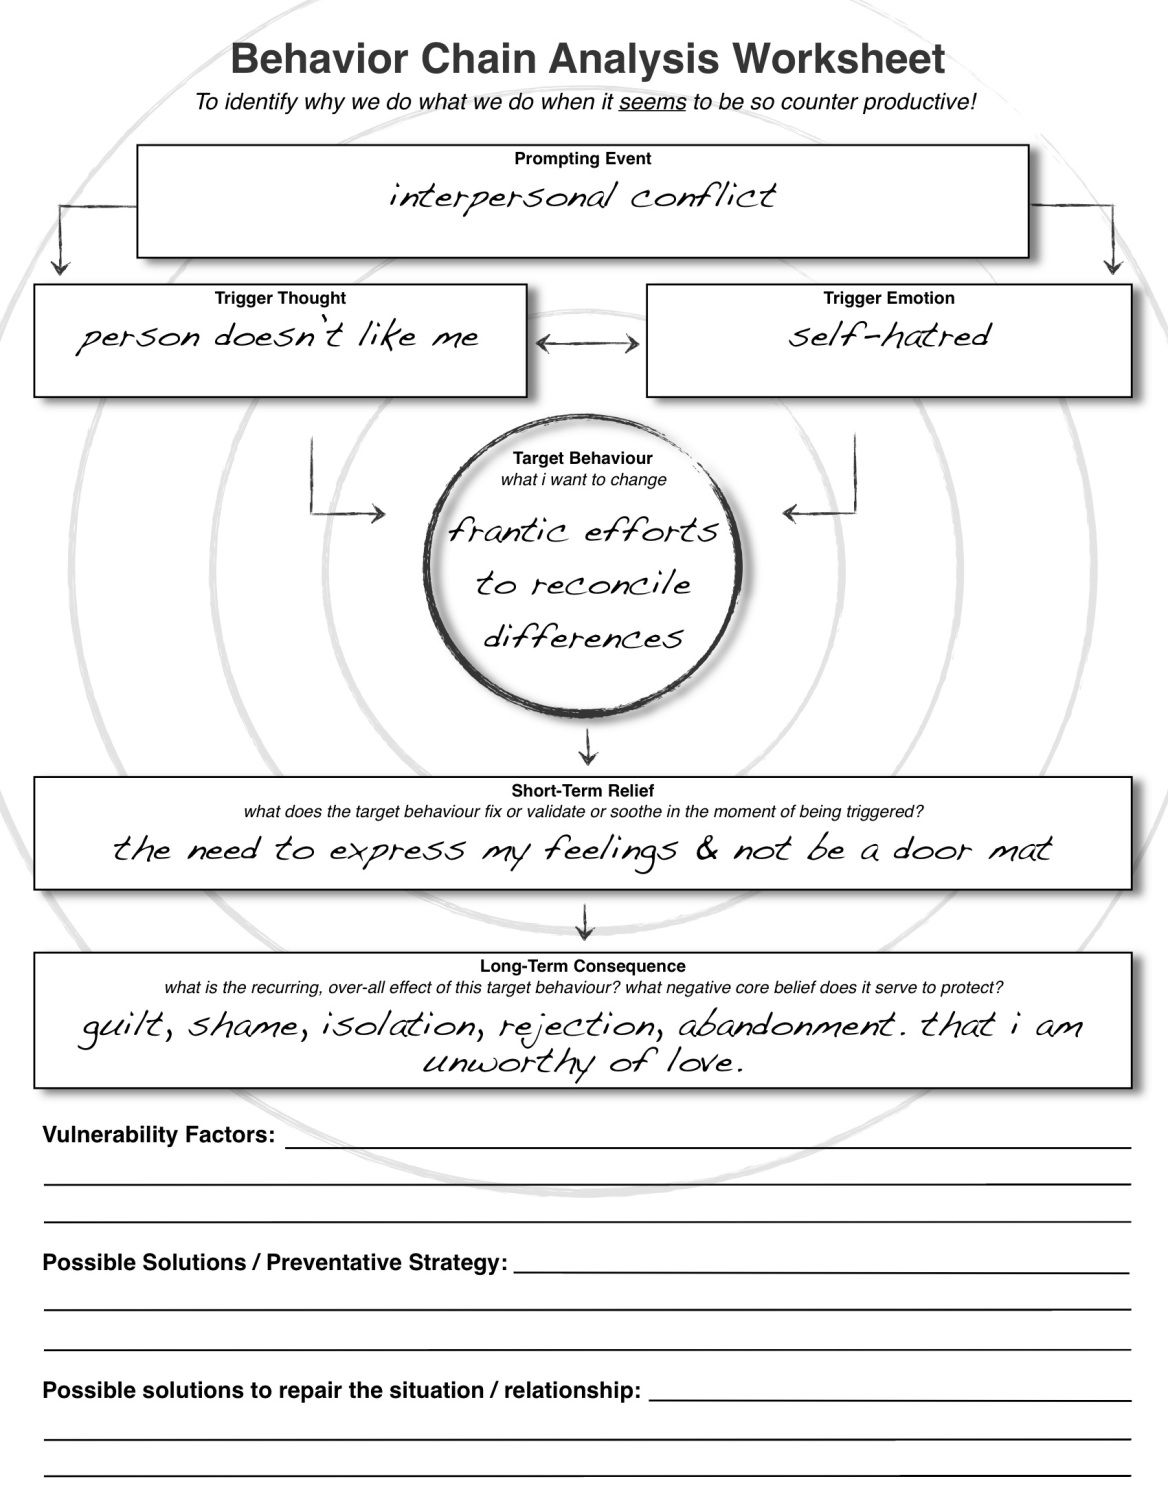 Dbt Behaviour Chainysis Worksheet